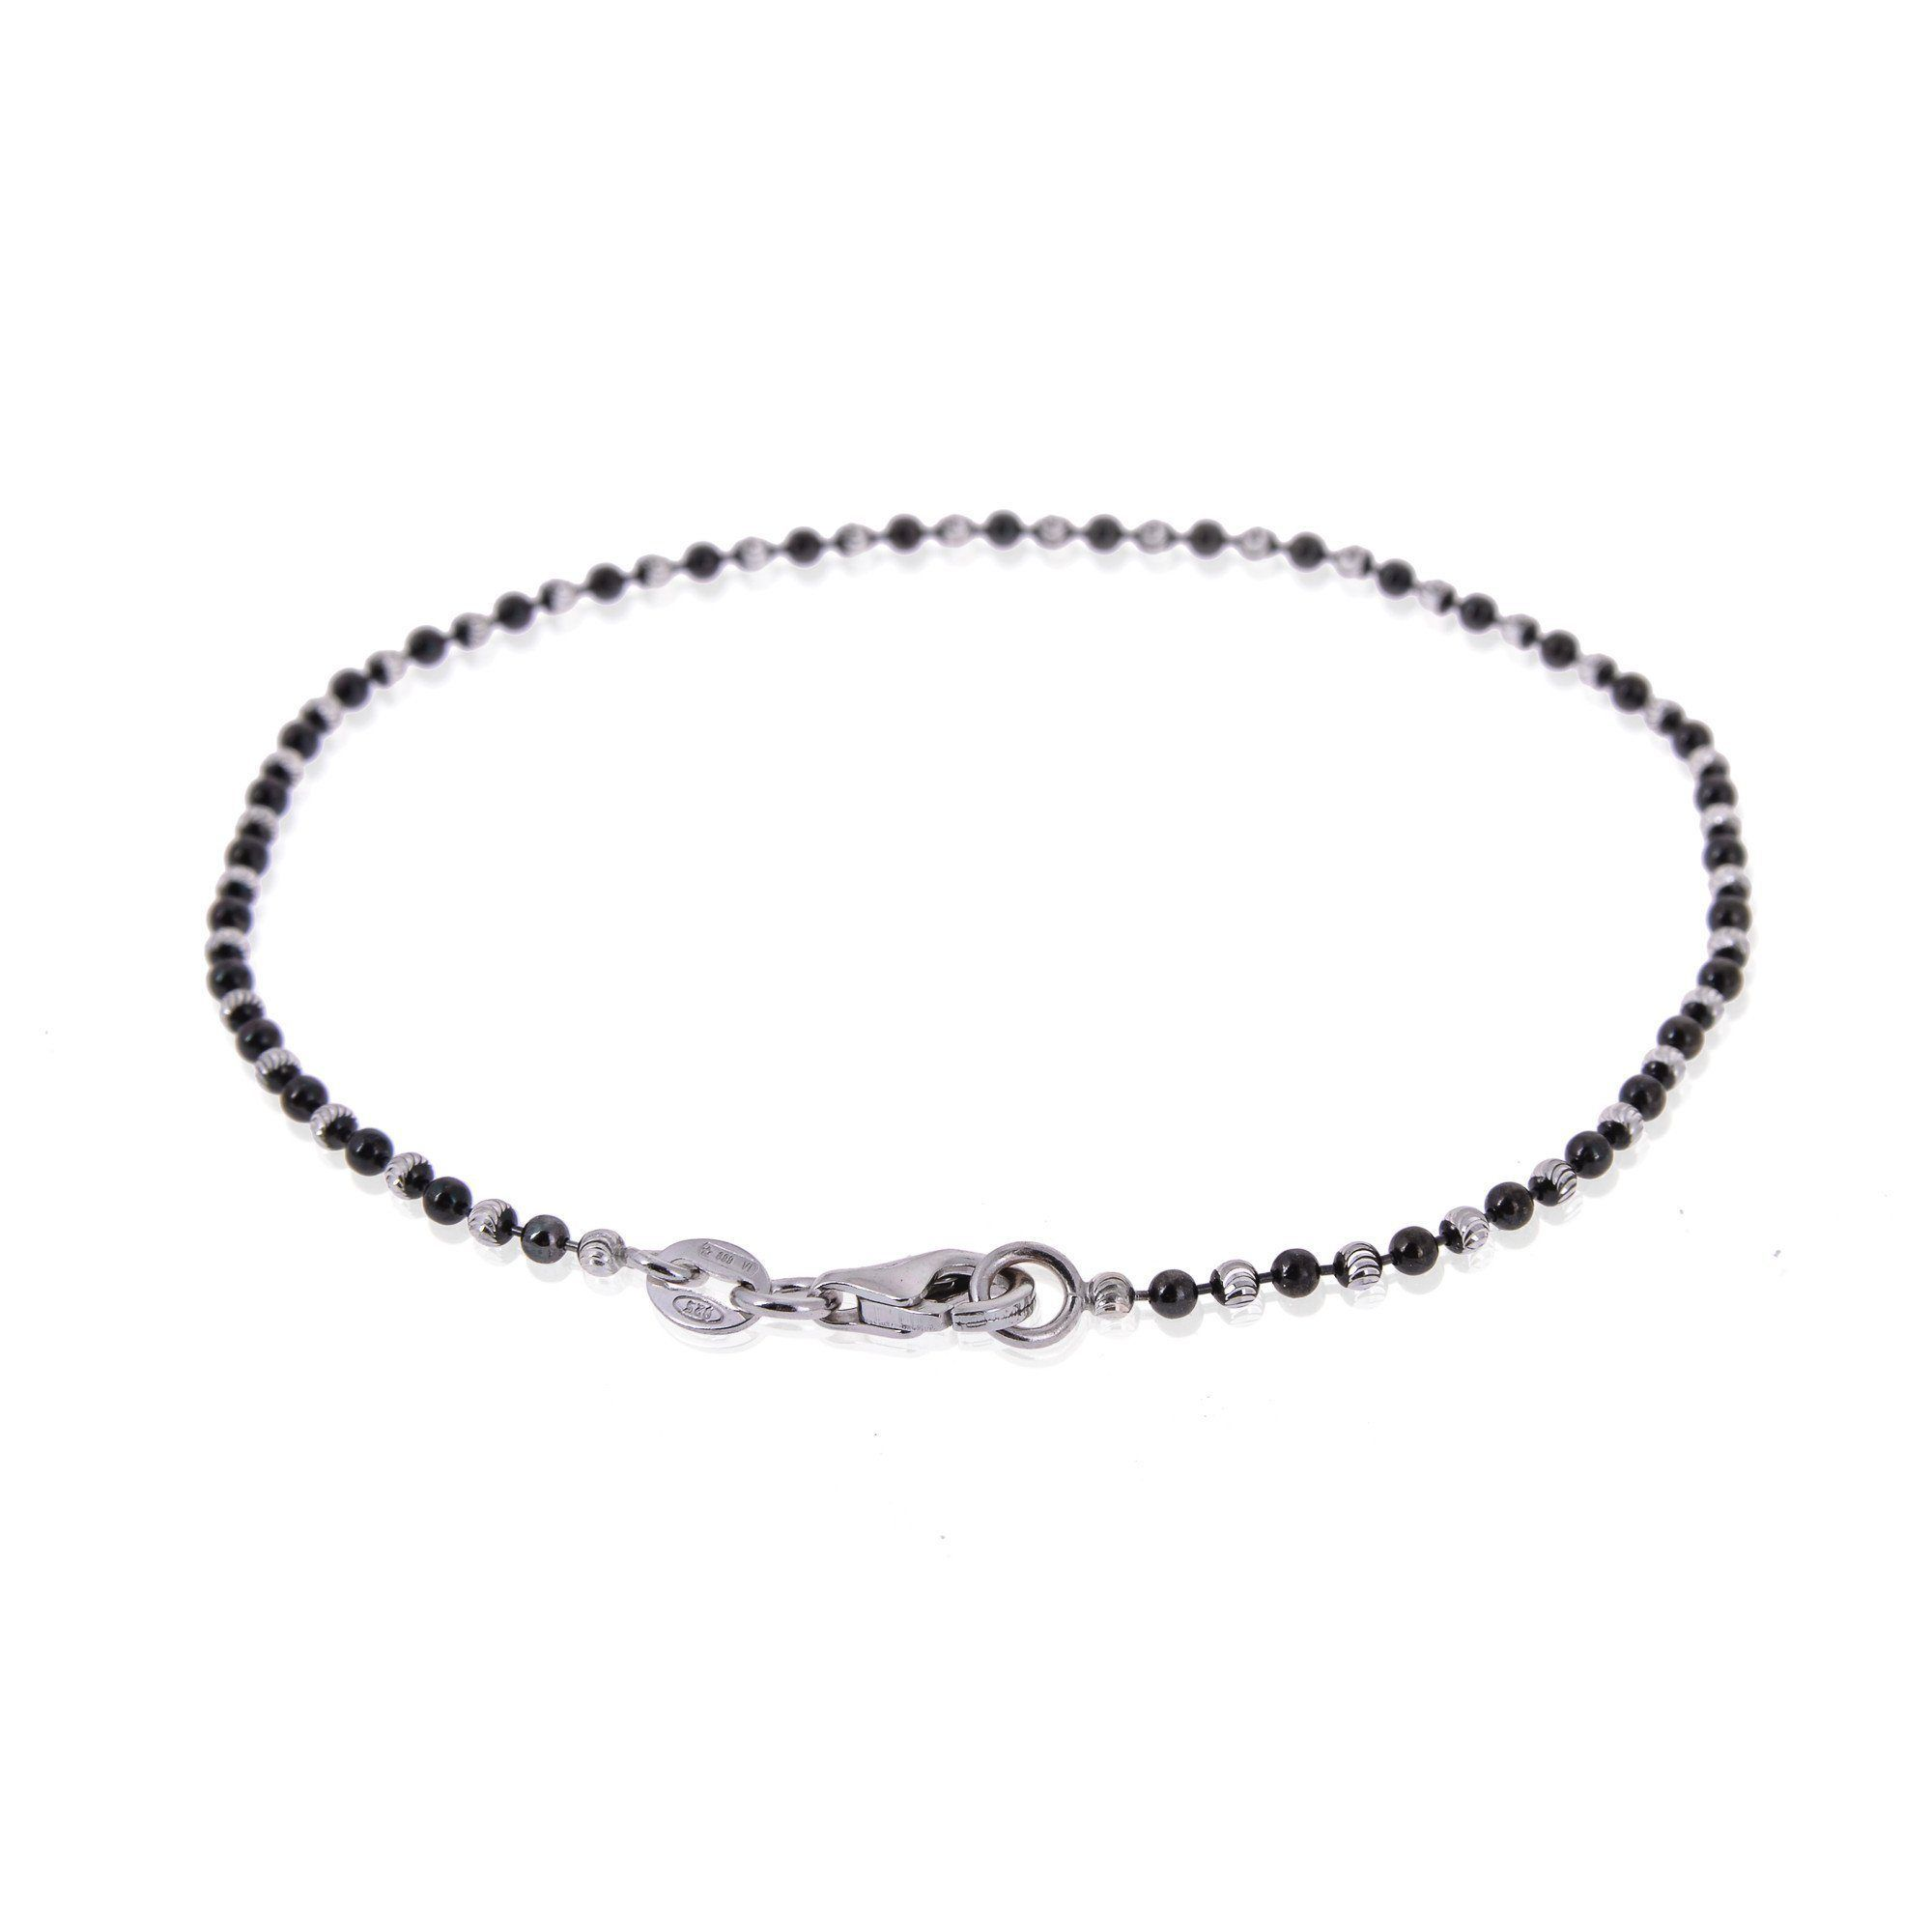 5dce04d371d Men's Sterling Silver Diamond Balls Chain Type Bracelet #silver  #thinkpositivefashioncafe #thinkpositive #jewellery #antoniomarsocci ...